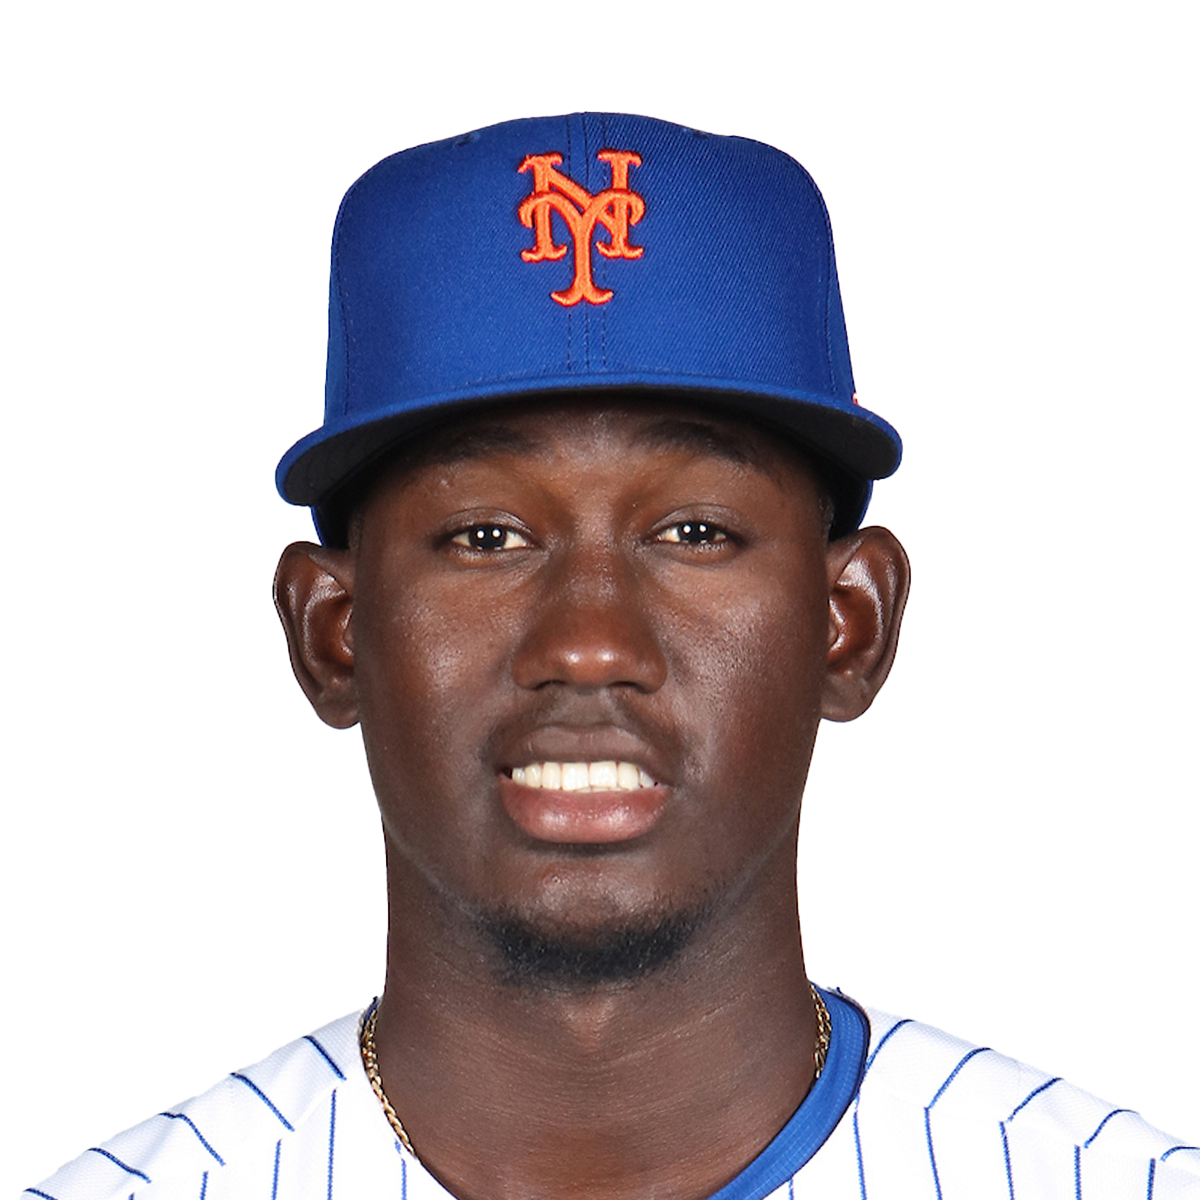 Minor League Mondays: Ronny Mauricio has been doing well in Brooklyn